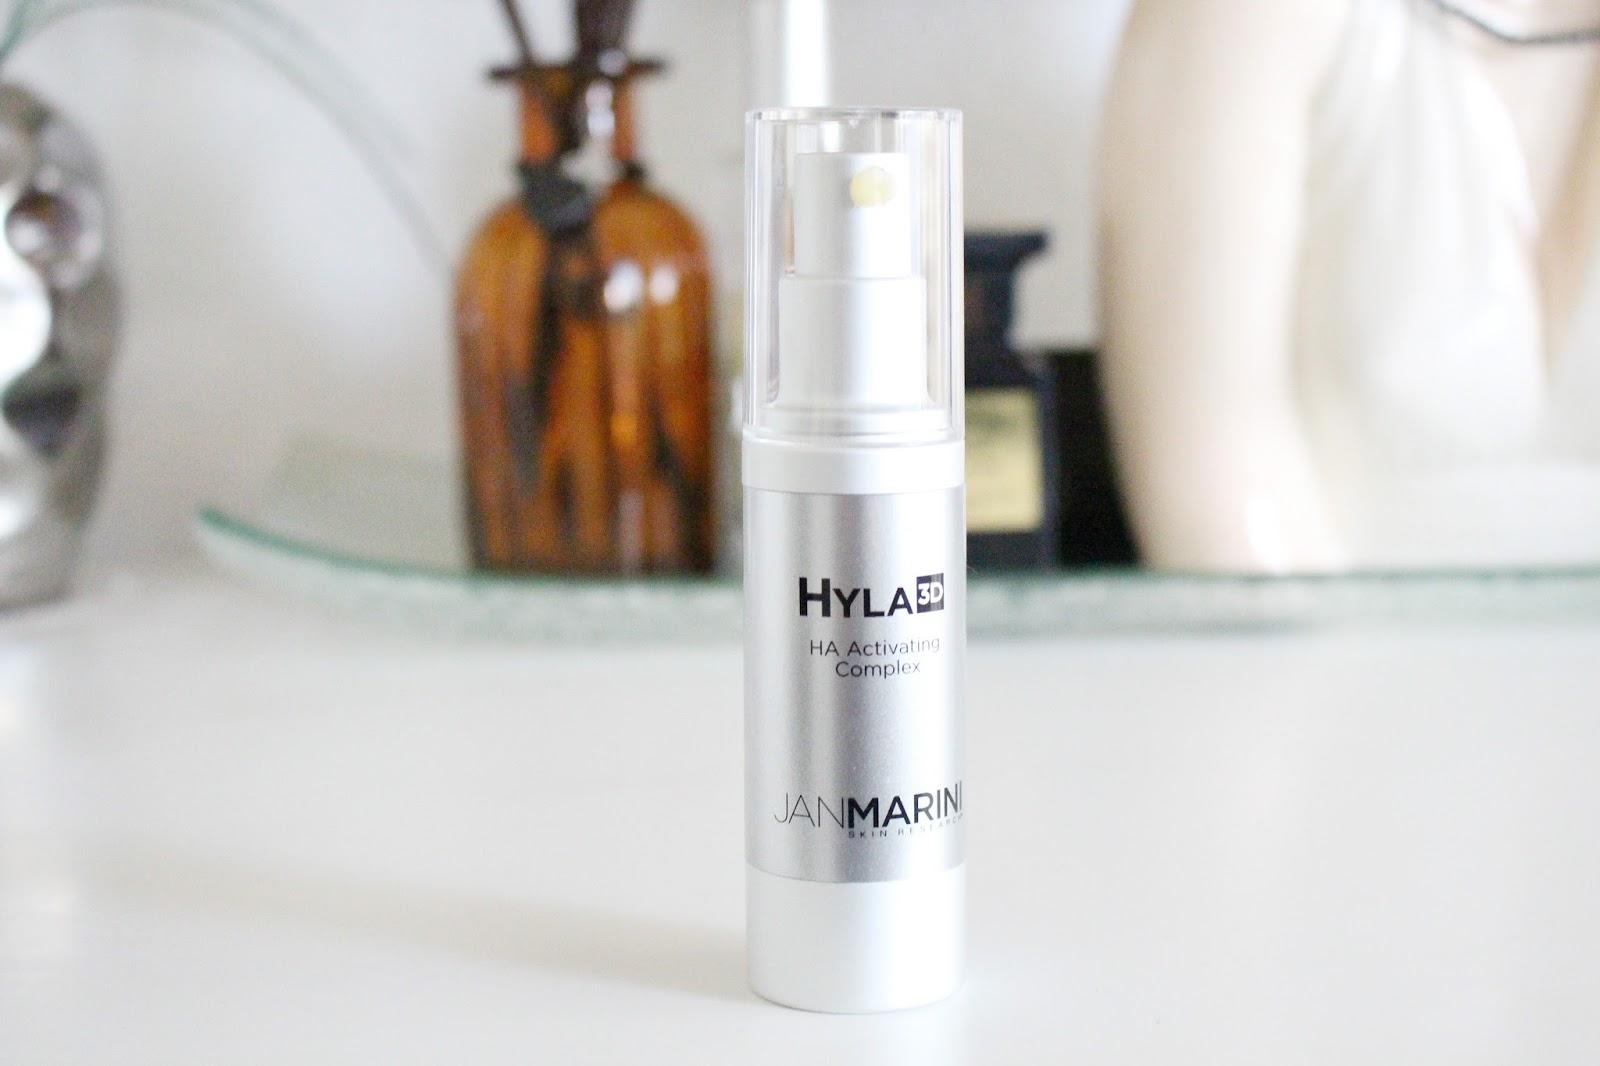 hyaluronic acid in skincare, sodium hyaluronate in skincare, jan marini hyla3d